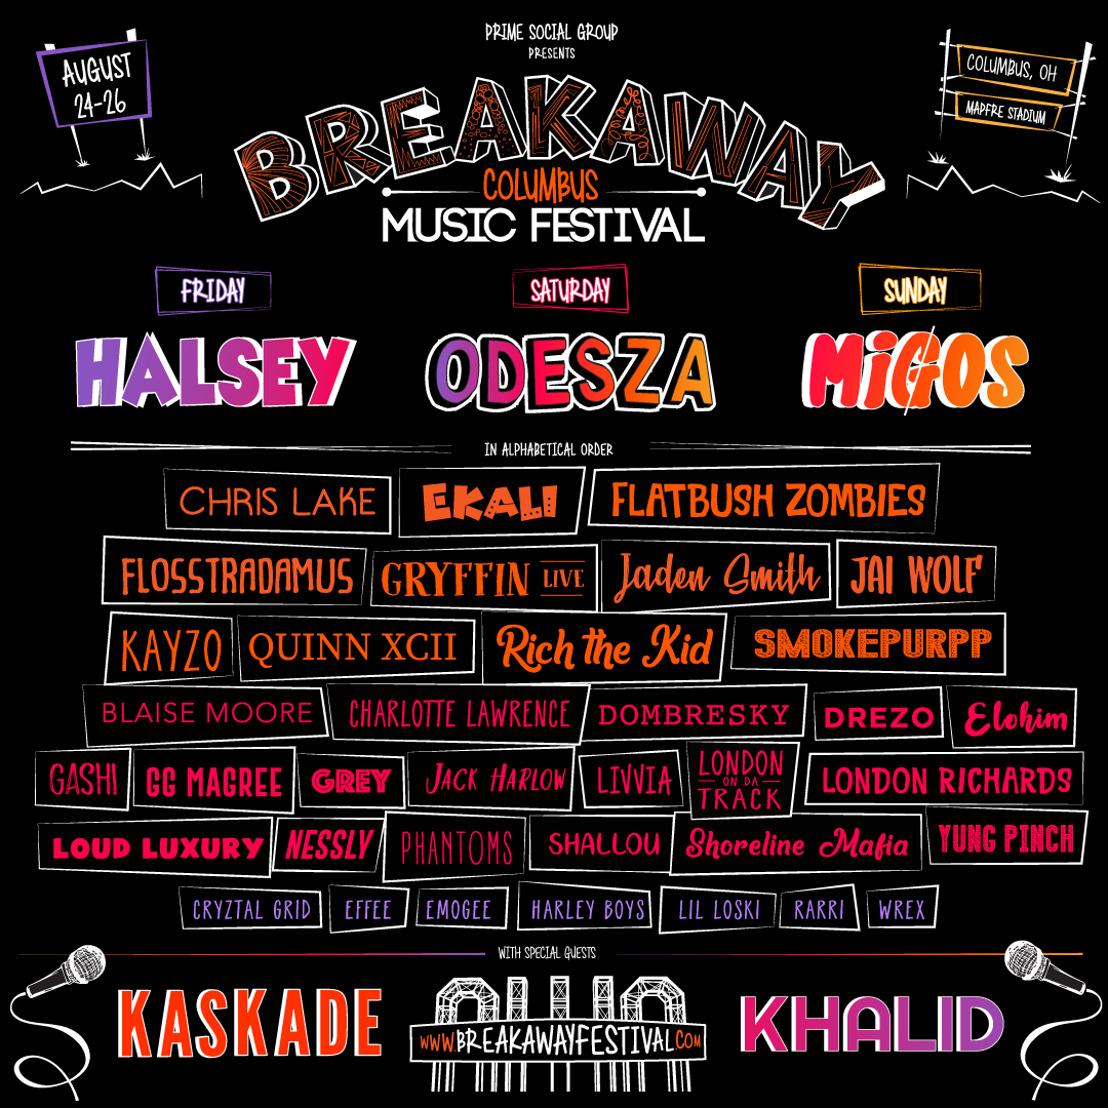 Prime Social Group Announces Lineups for their Breakaway Music Festival in Columbus & Grand Rapids